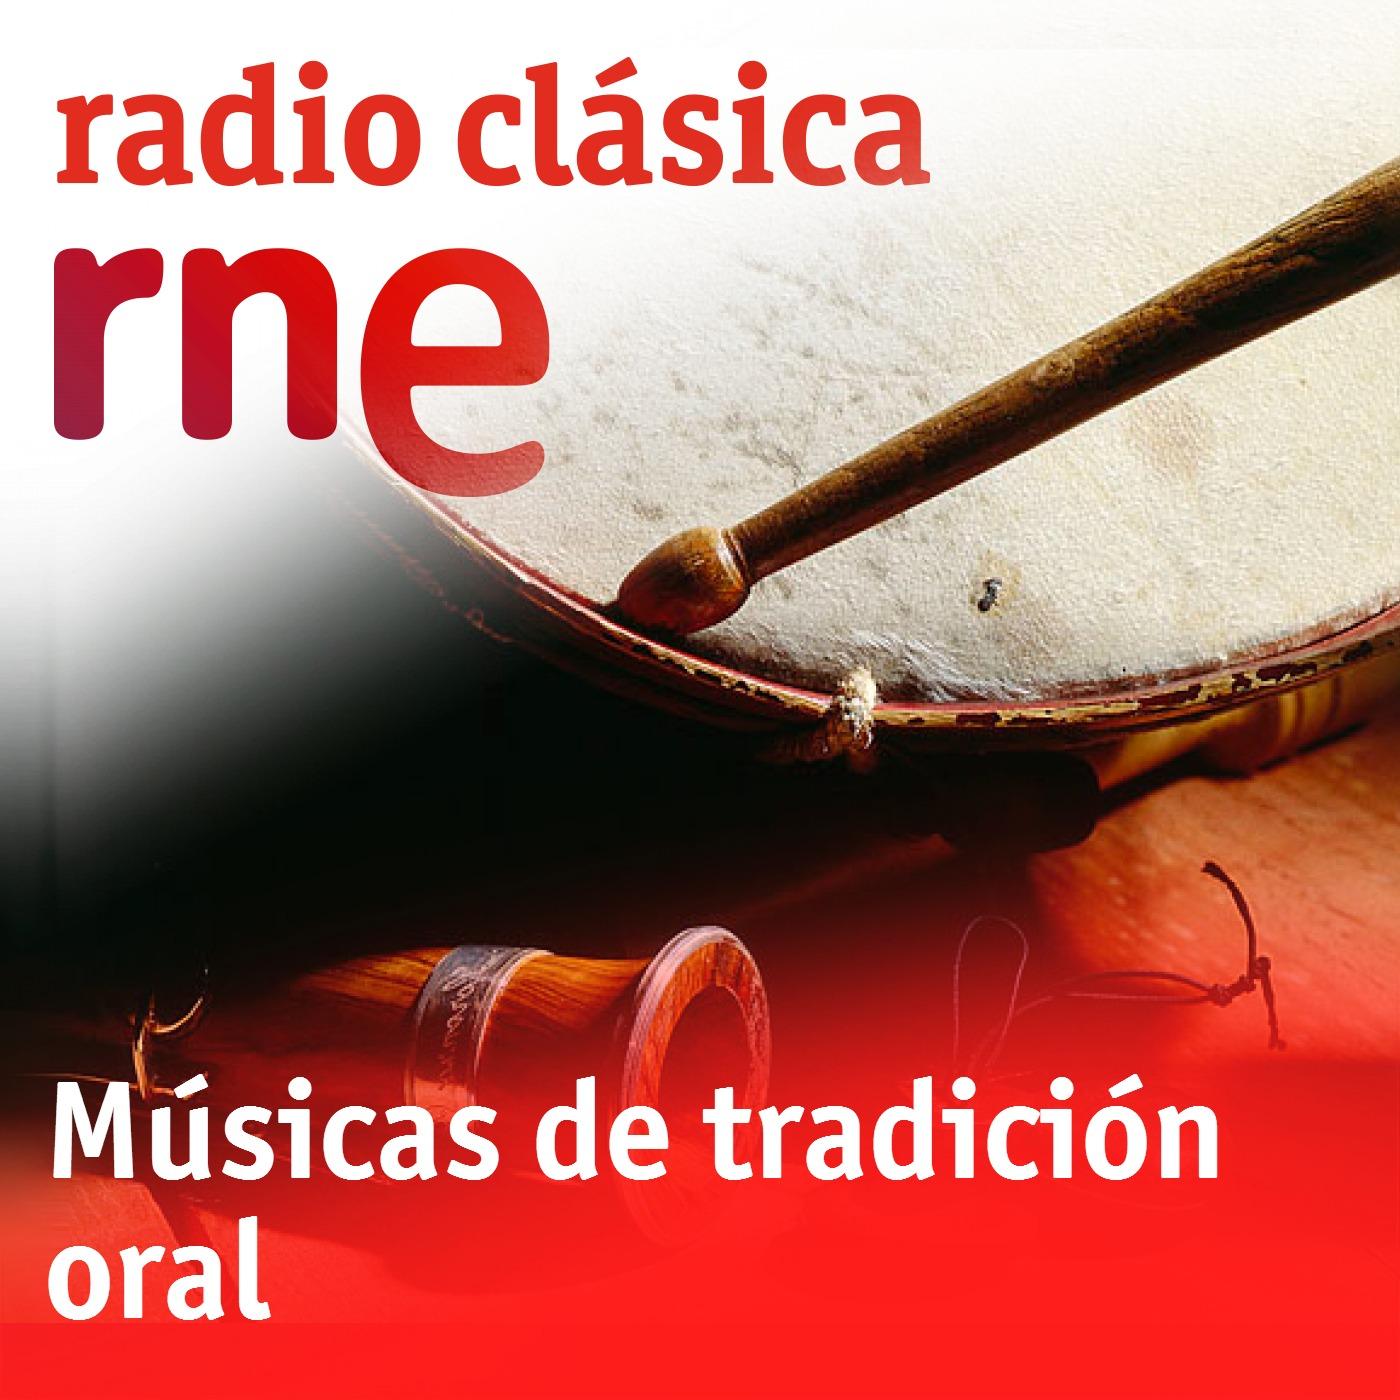 Músicas de tradición oral